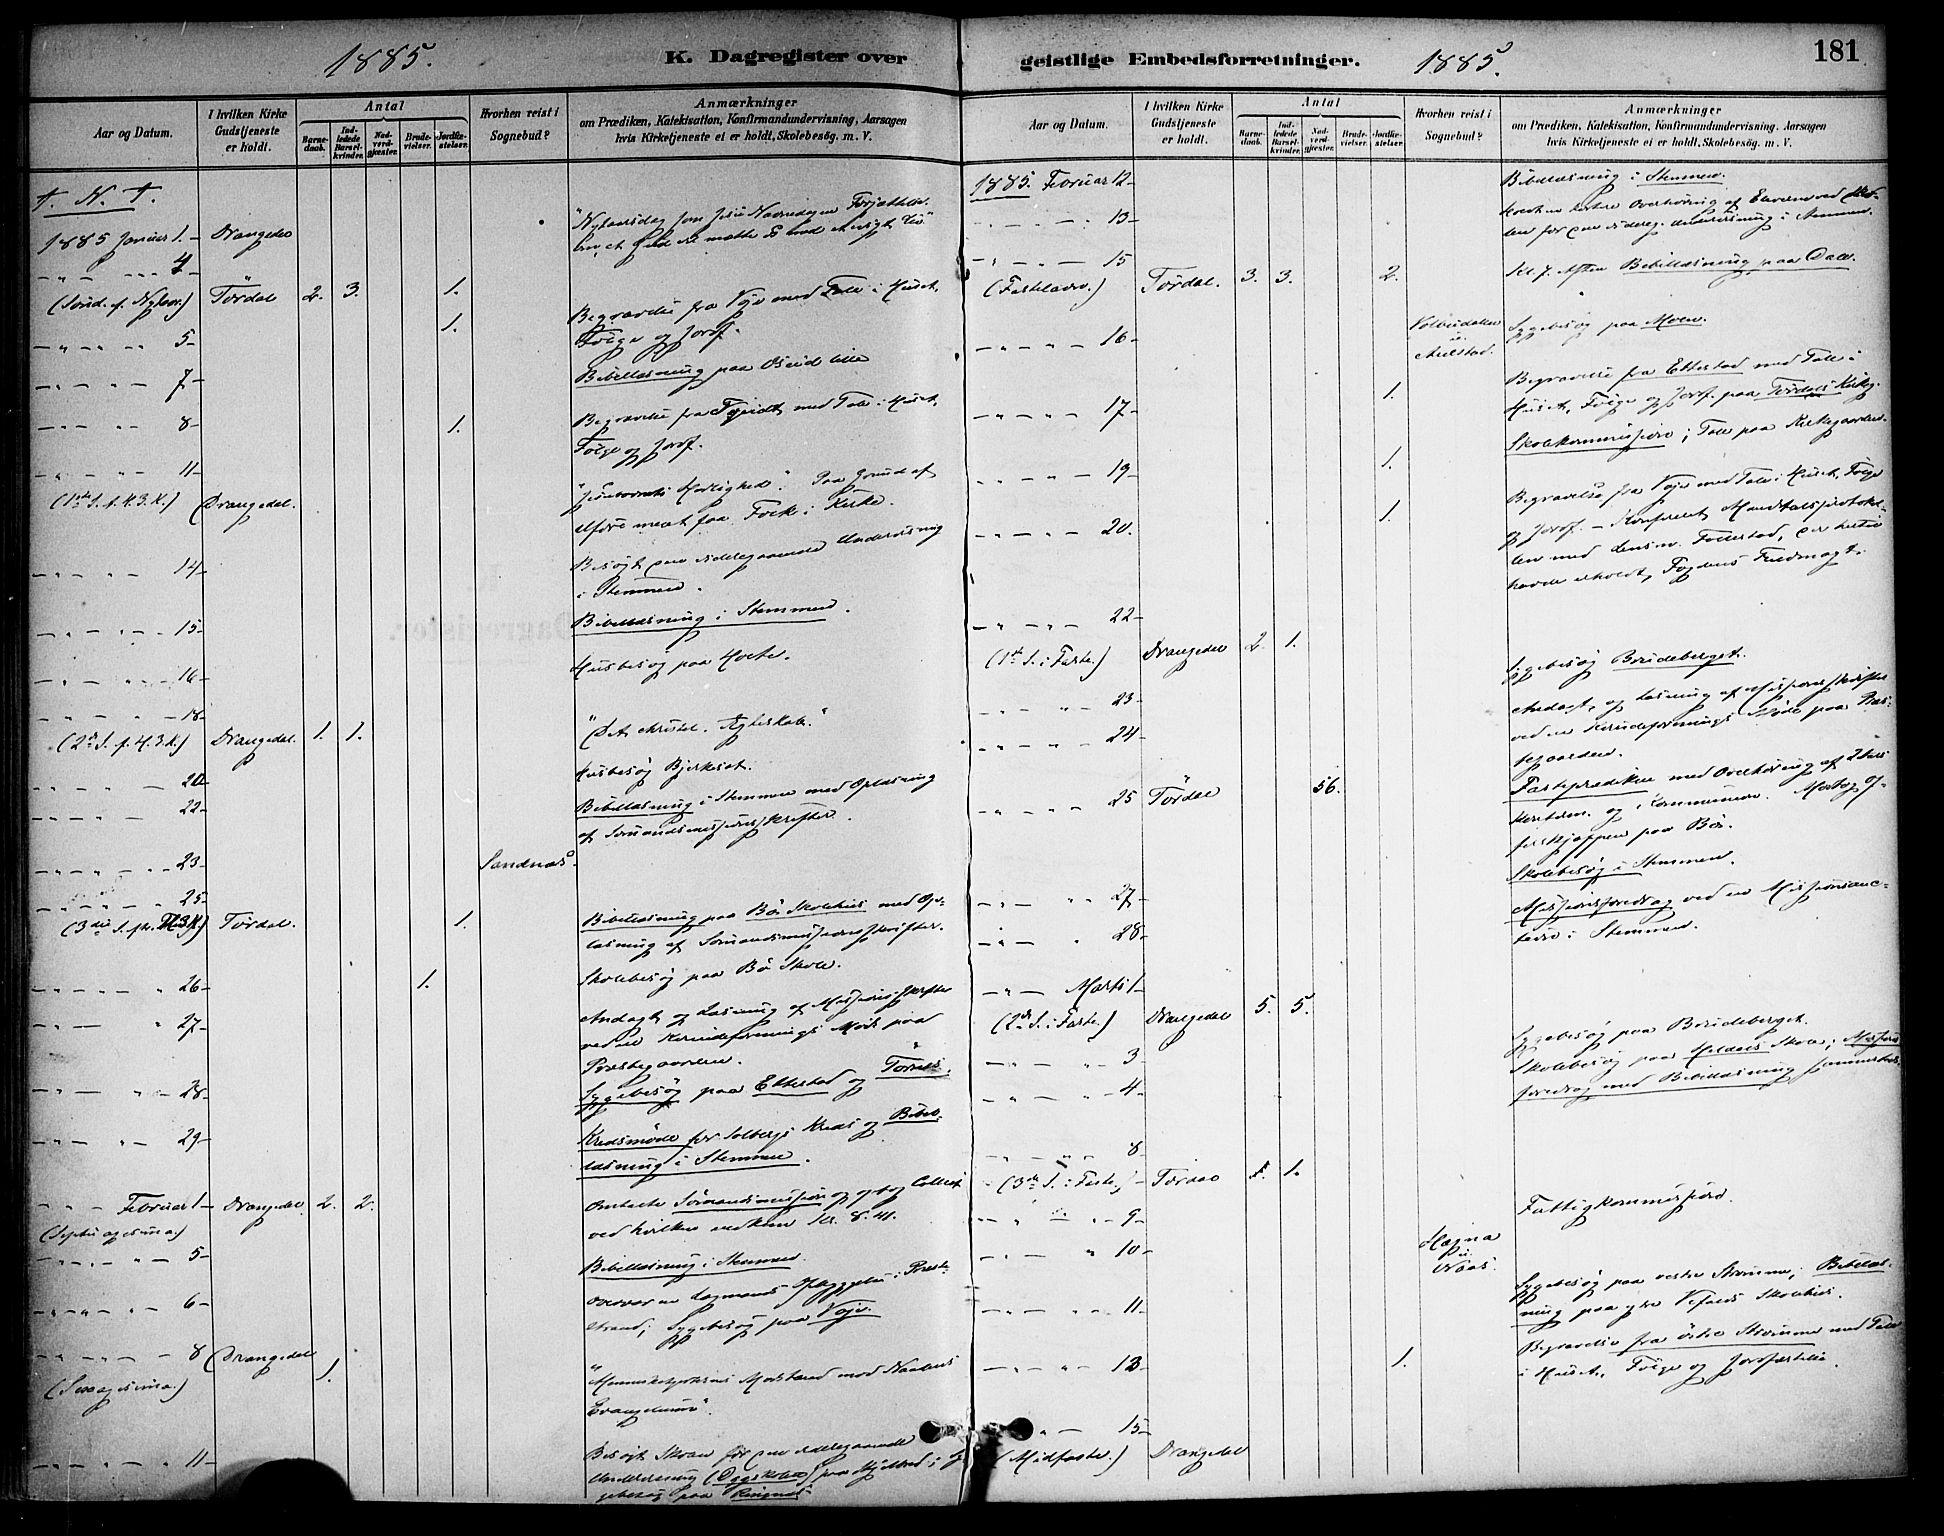 SAKO, Drangedal kirkebøker, F/Fa/L0011: Ministerialbok nr. 11 /1, 1885-1894, s. 181